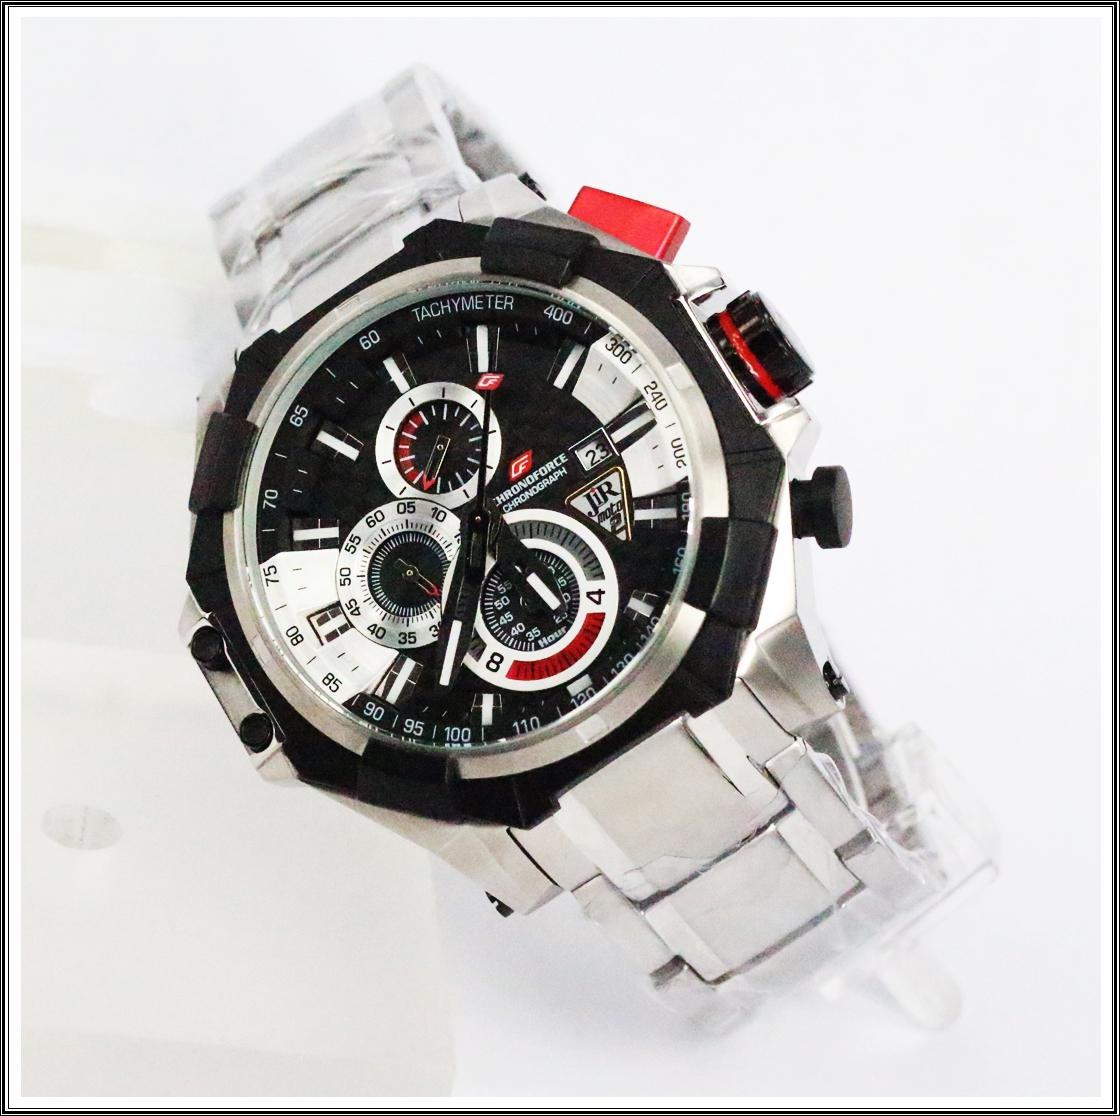 jam tangan pria original Swiss Cronoforce 5209gcbssbb